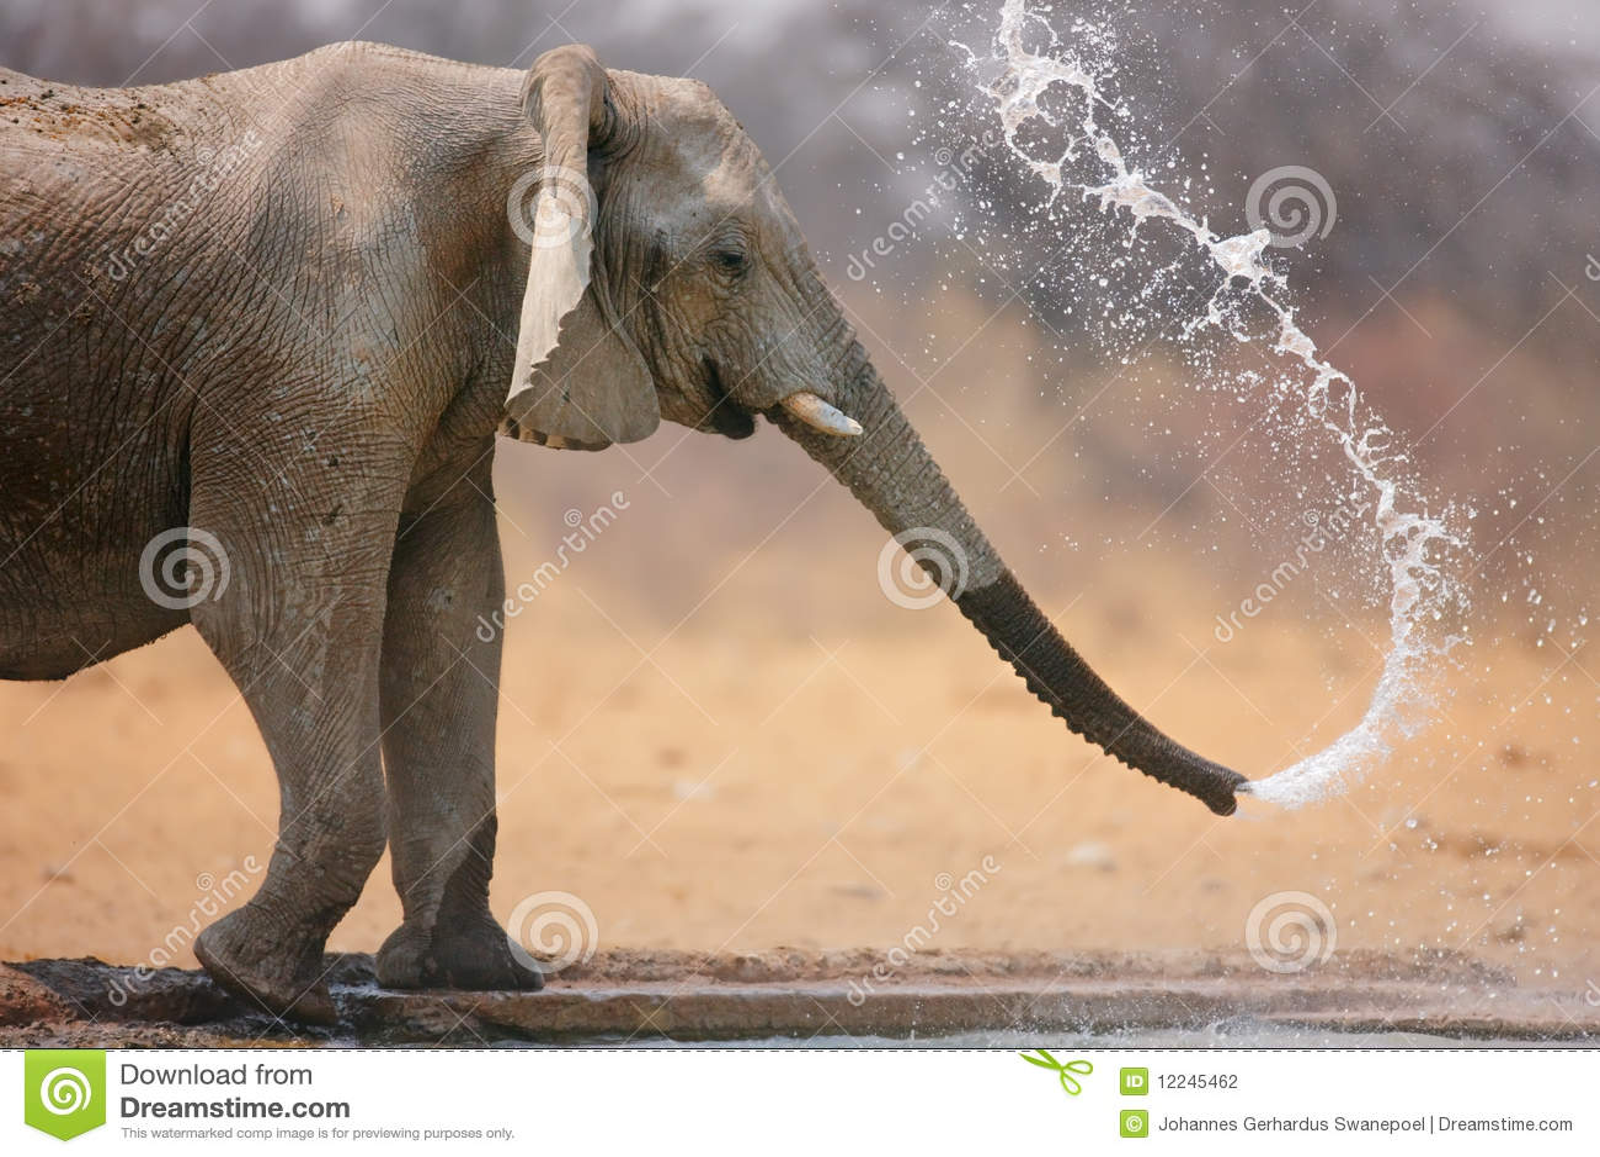 Elephant throwing water